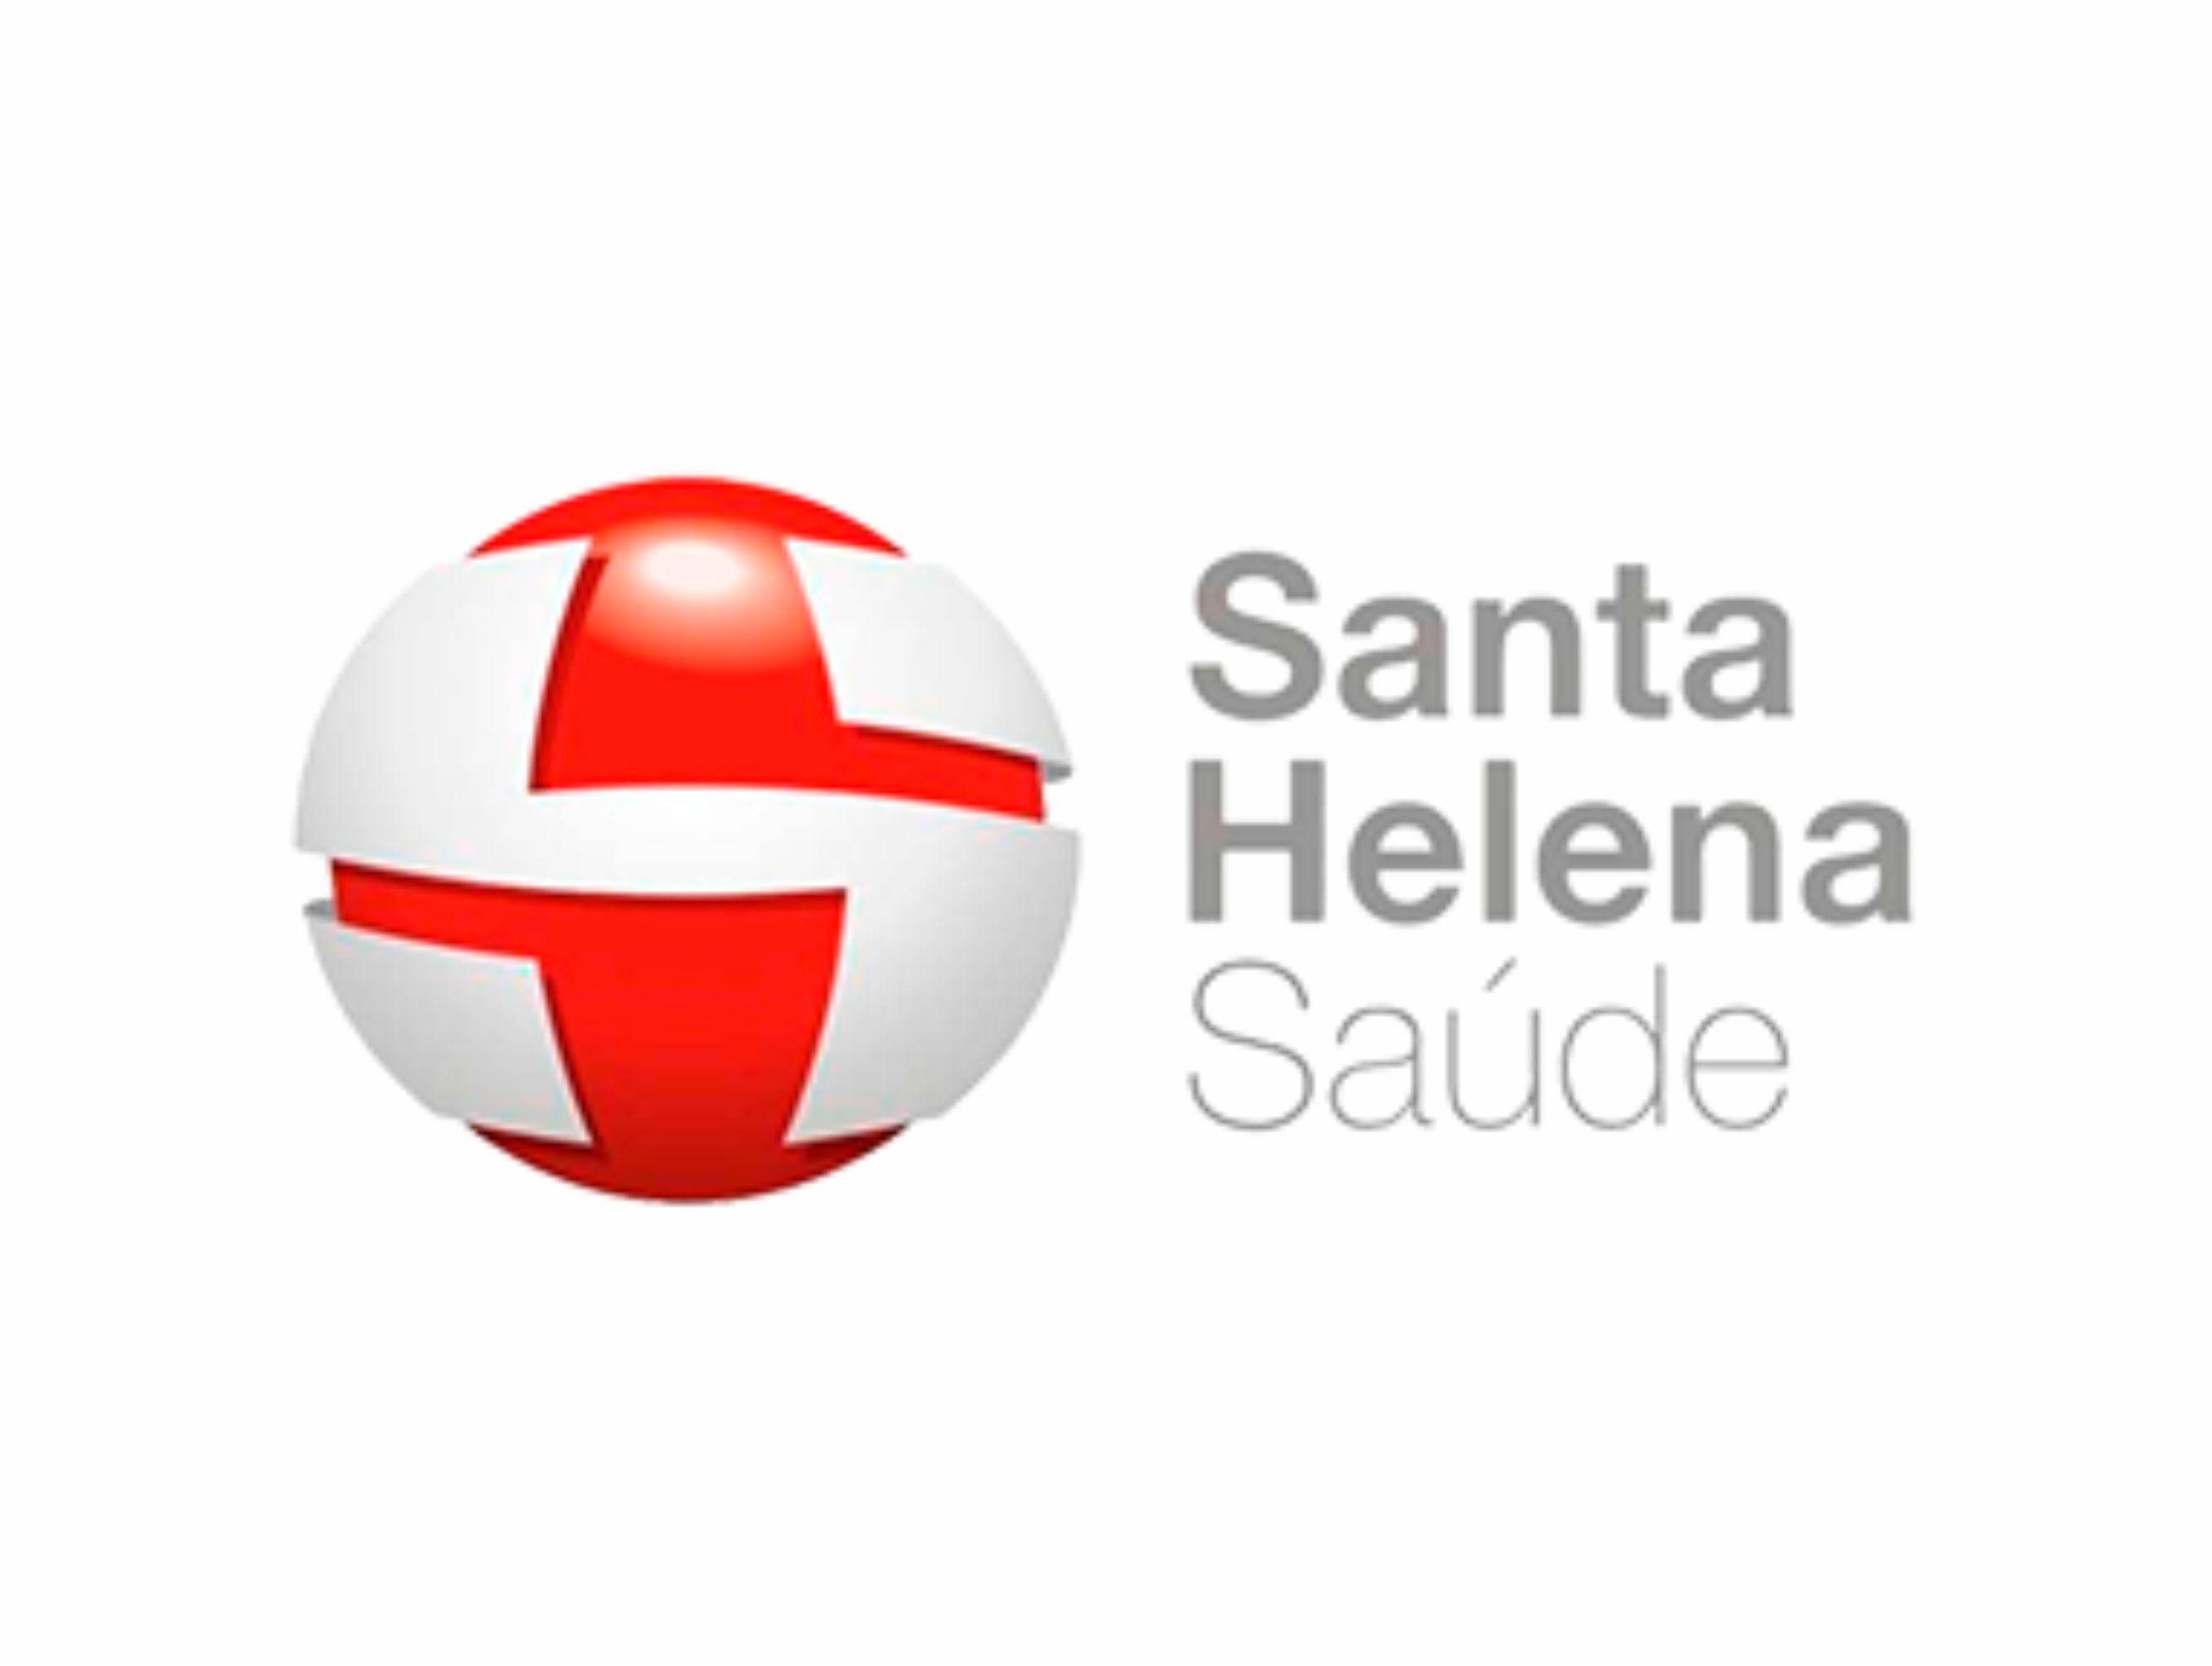 Santa Helena Saúde